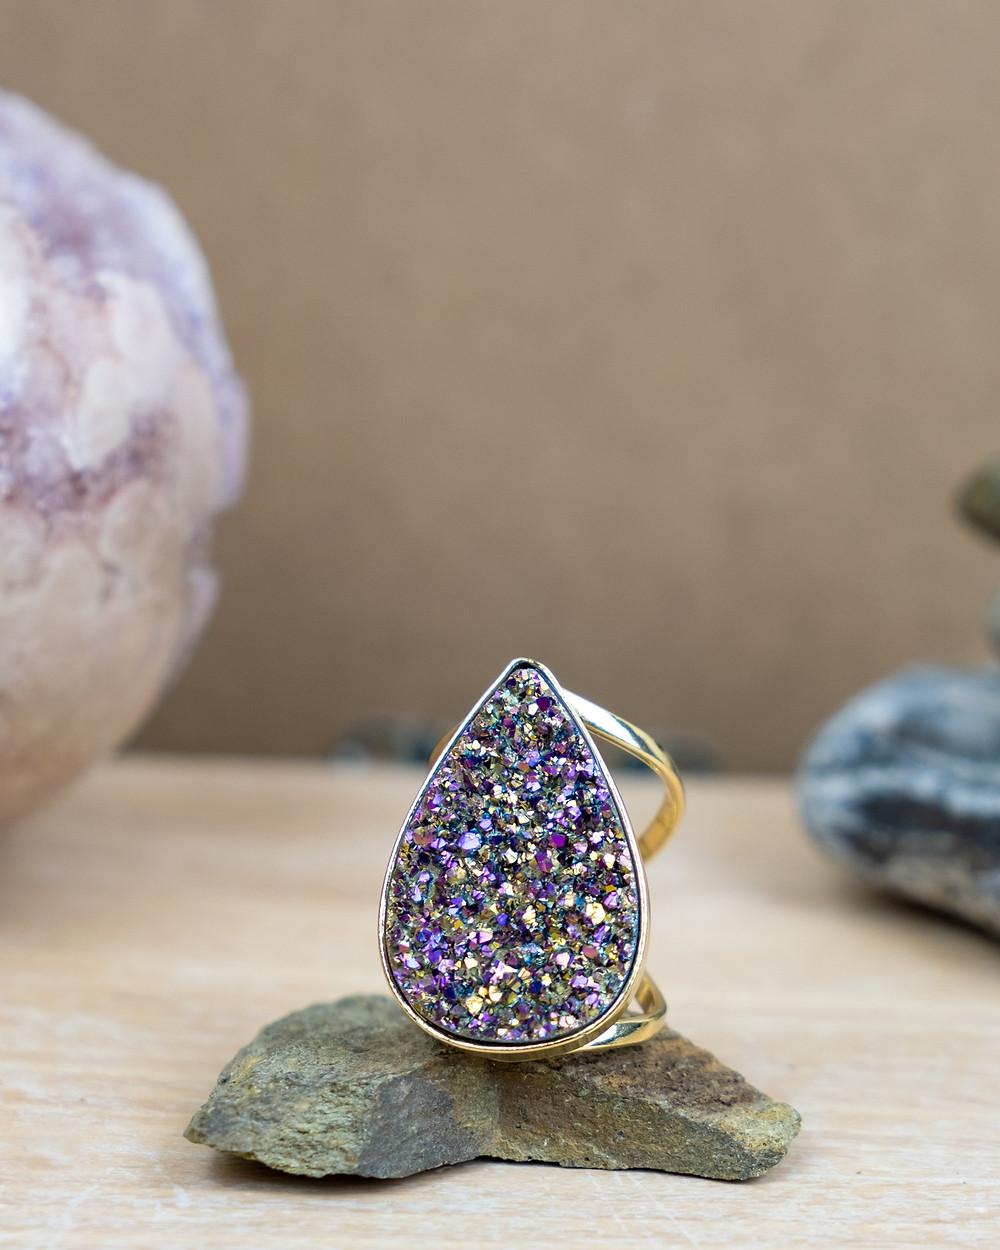 Tiana Jewel Divine Love Tear Drop Rainbow Metallic Ring